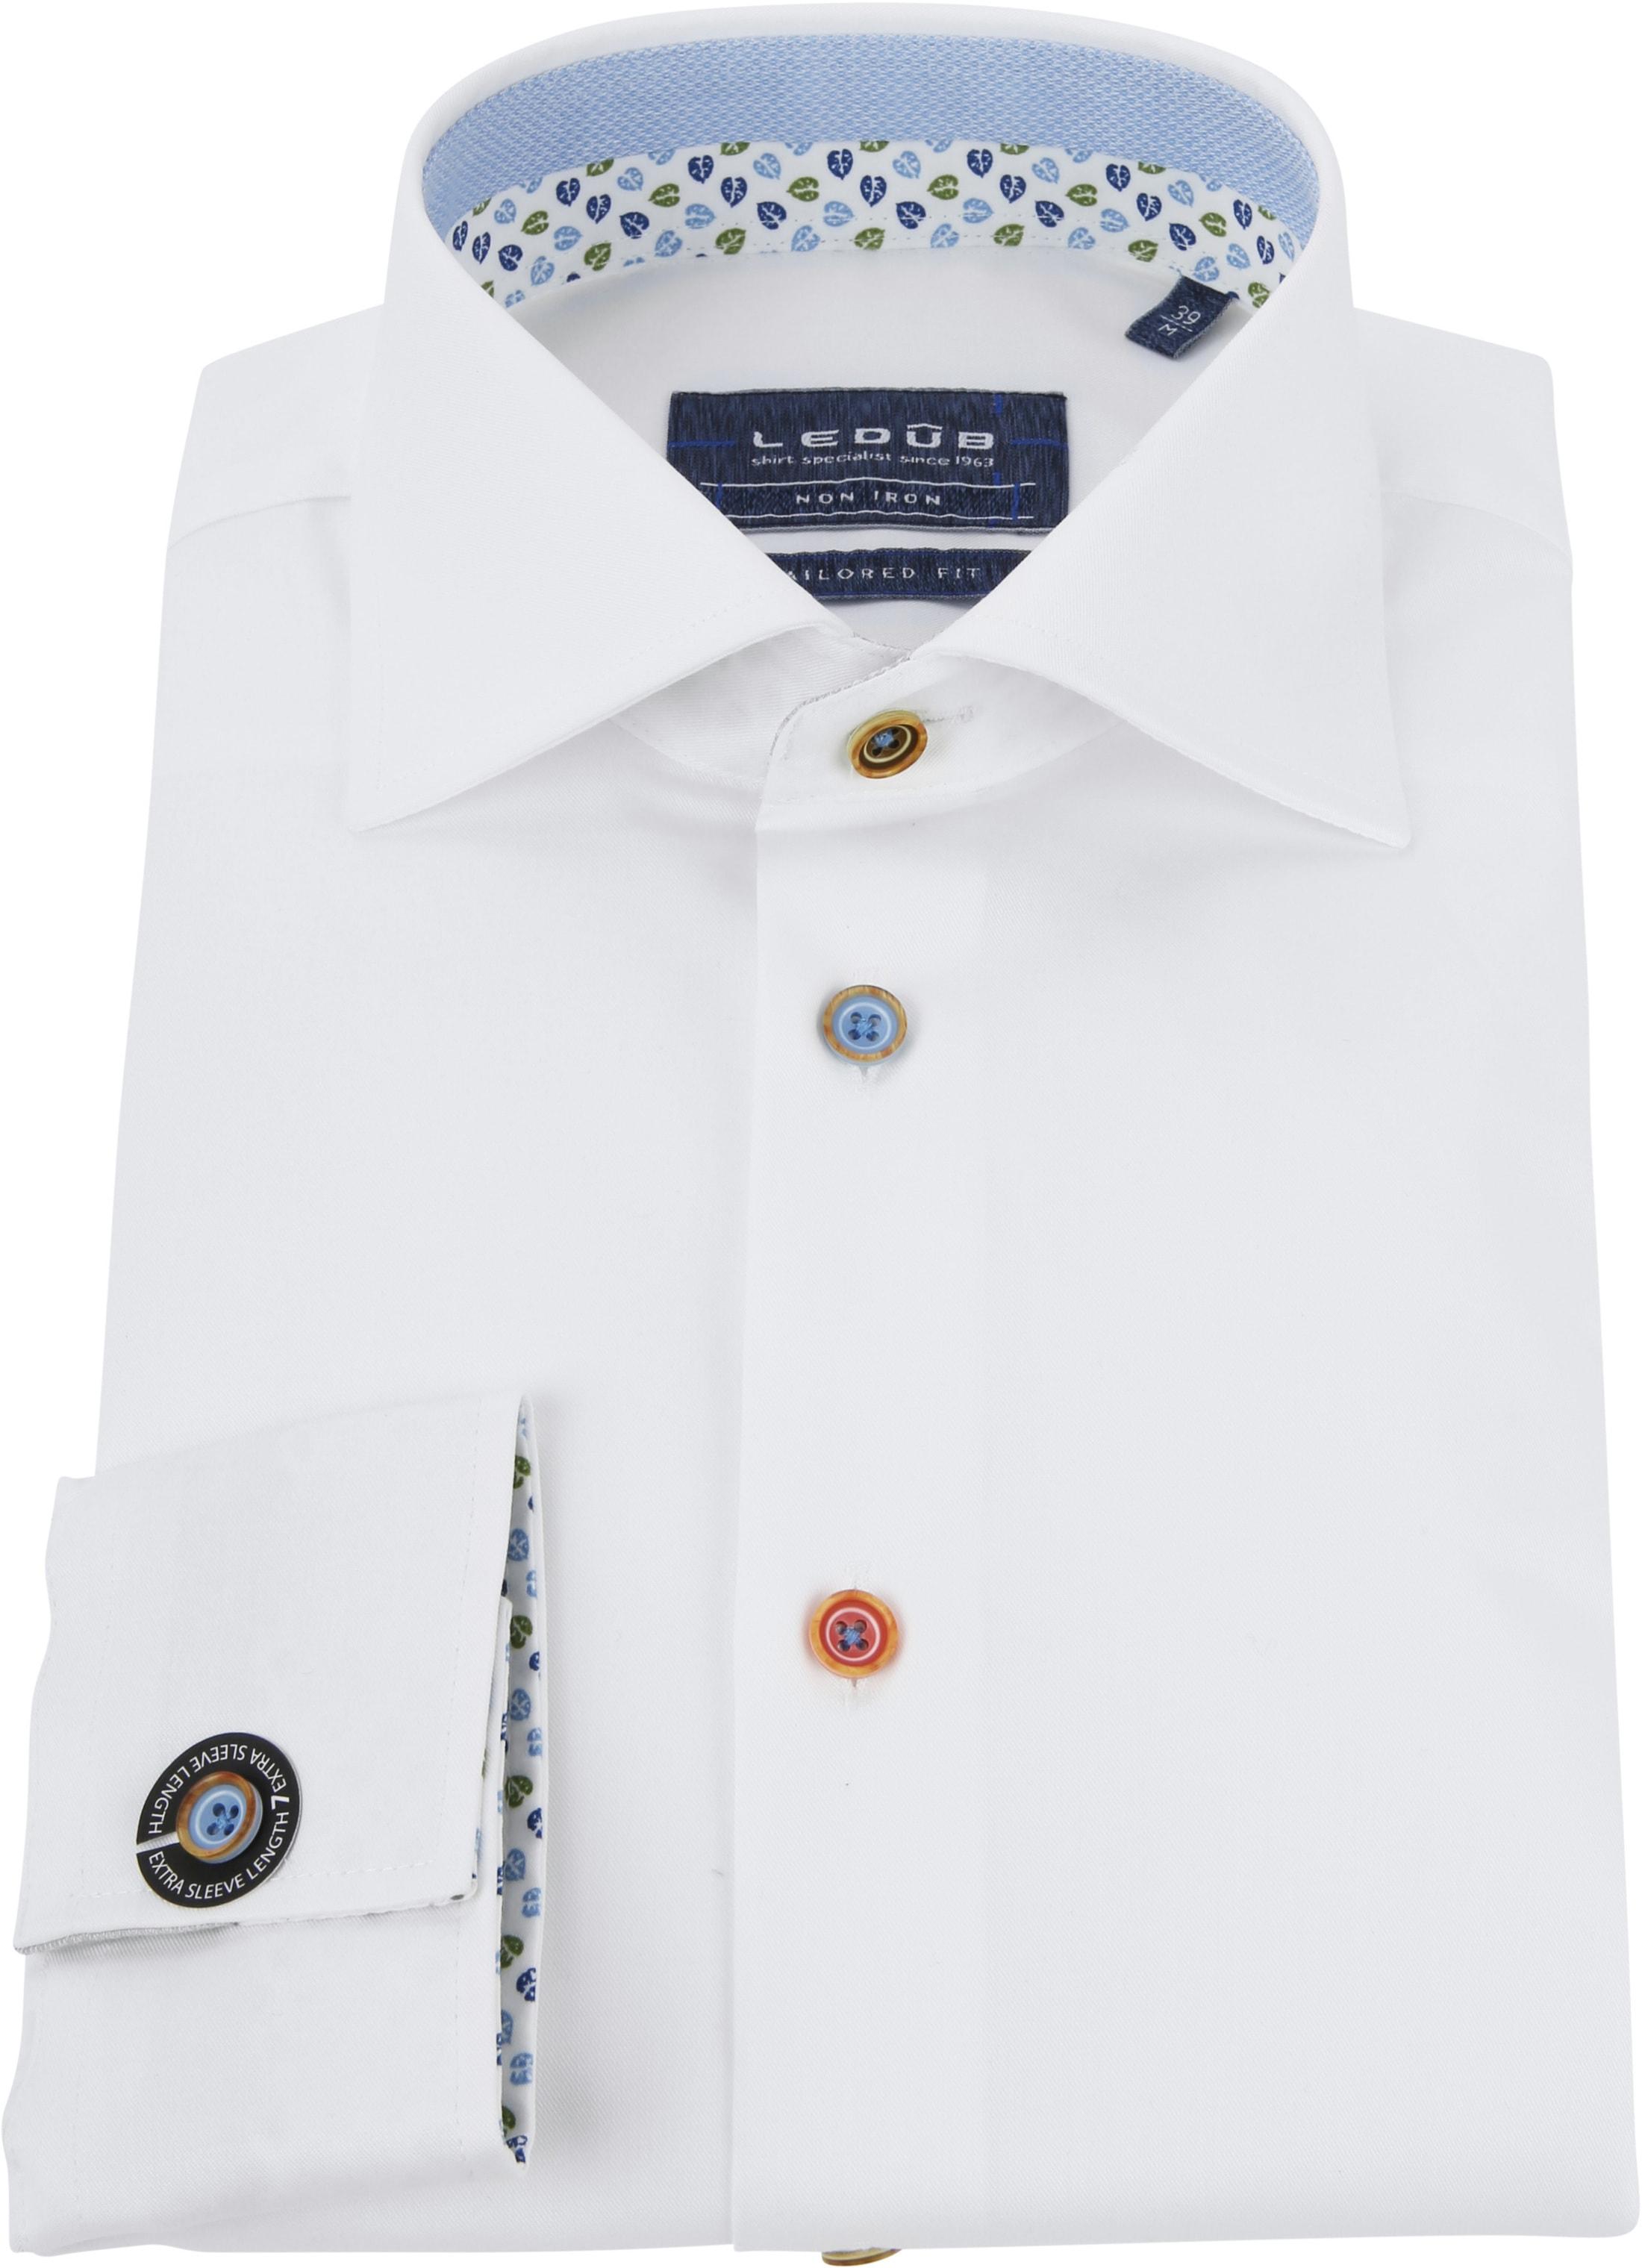 Ledub Shirt Button White SL7 foto 3